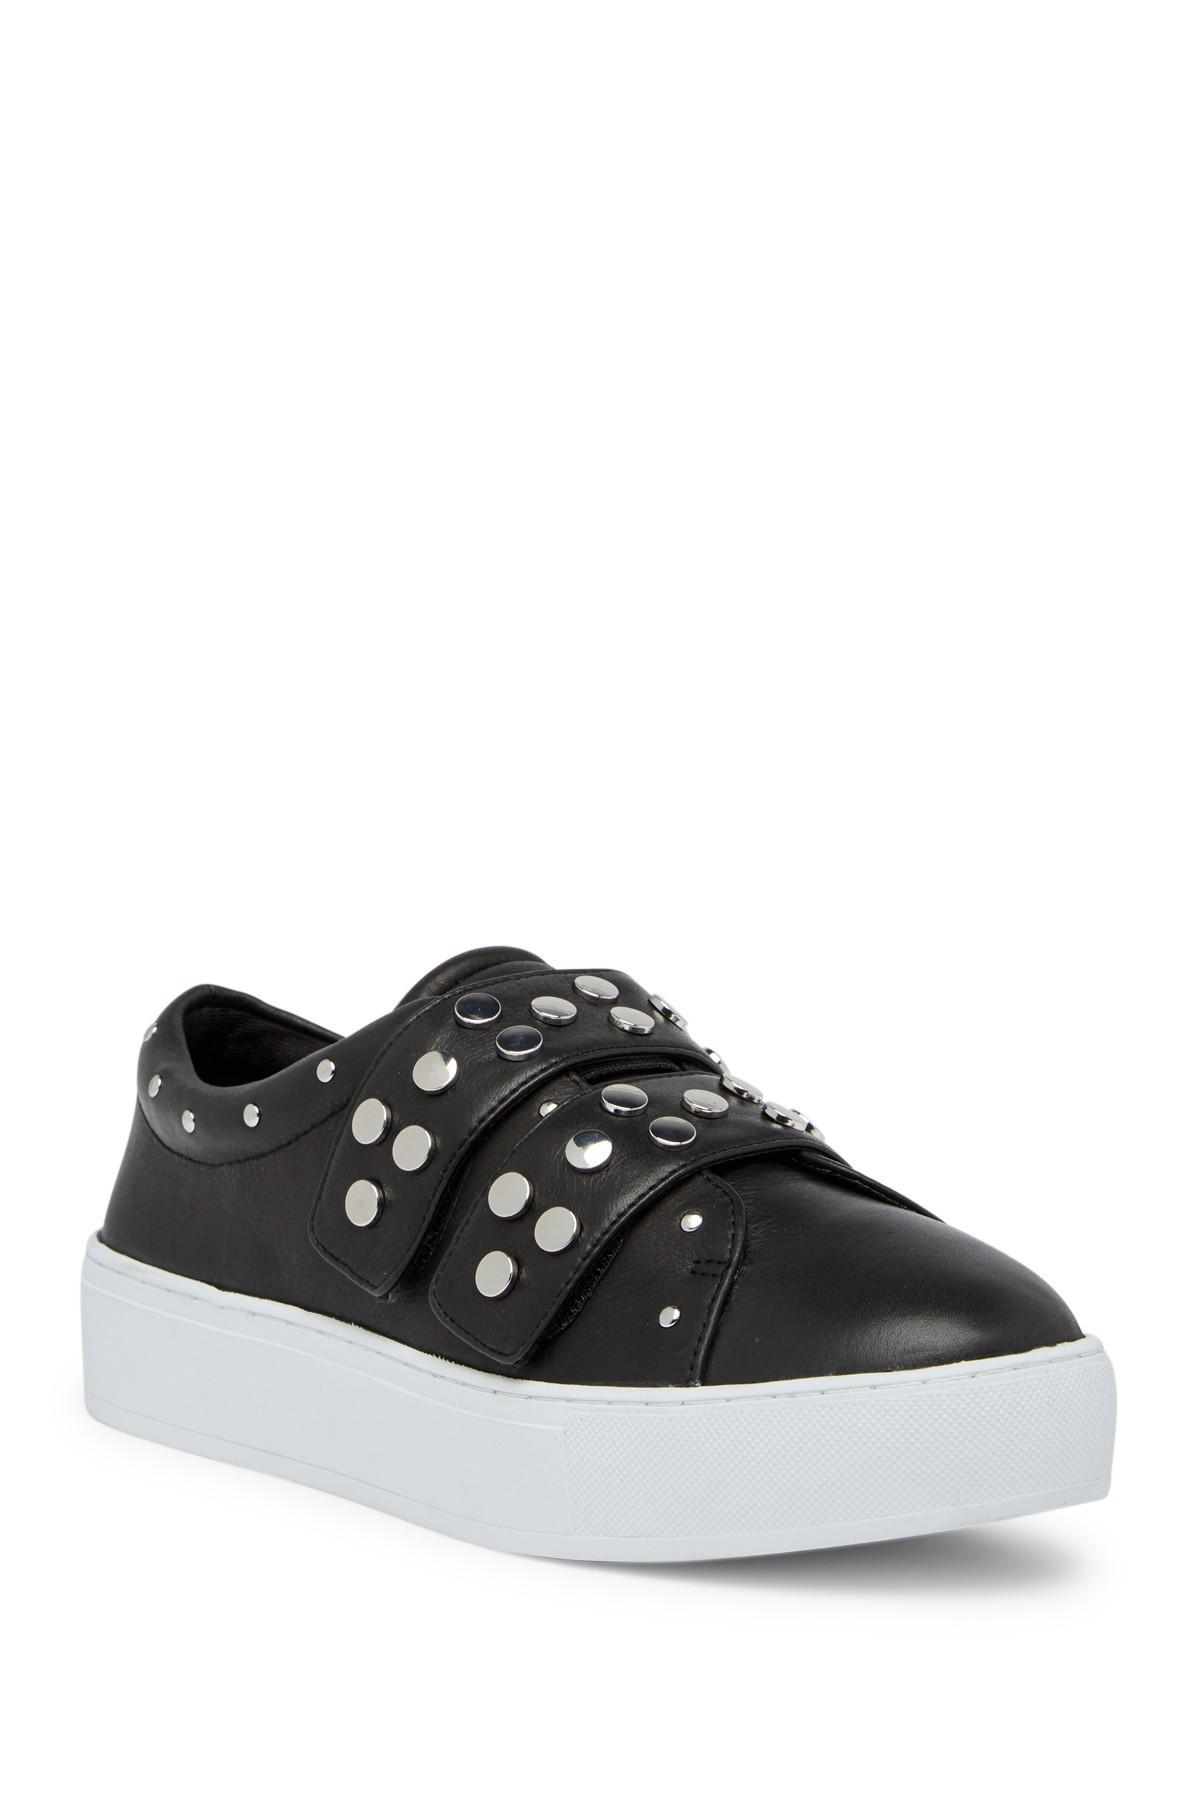 Rebecca Minkoff Patent Leather Flatform Sneakers sale ebay hgao6tGoP